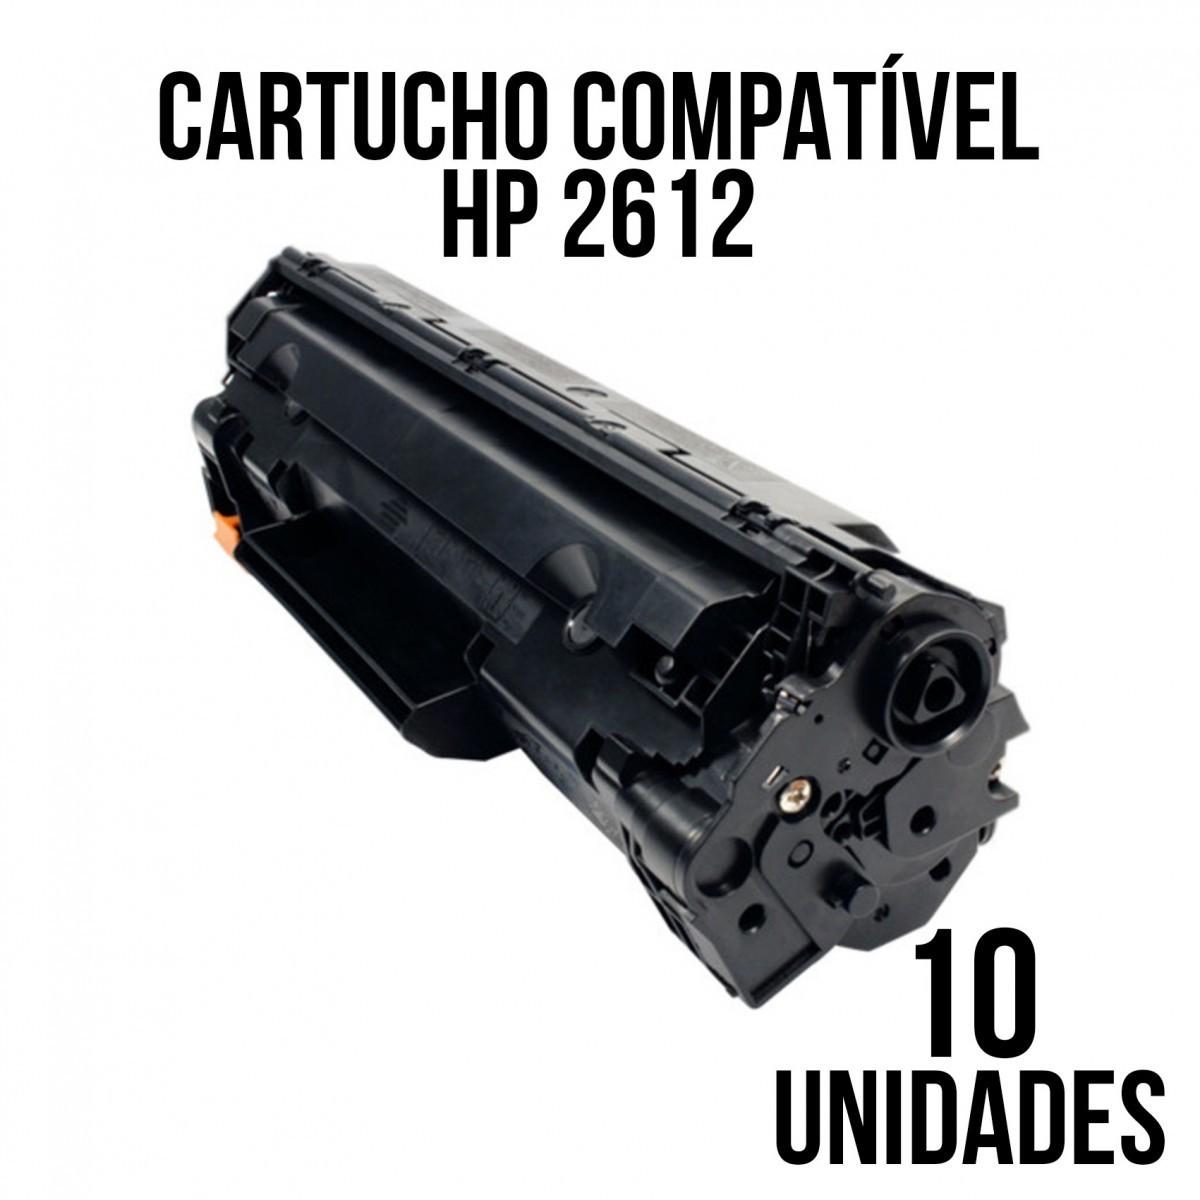 TONER HP 2612 A COMP. (PERSONAL) - COM 10 UNIDADES LaserJet HP 3050, 3050Z, HP 1020, HP 1018, HP 1010, 1012, HP 1015, HP 1022, HP M1005, HP 3015, 3015, 3020, 3030, 3052, 3055, M1319, HP 1022nw e 1022